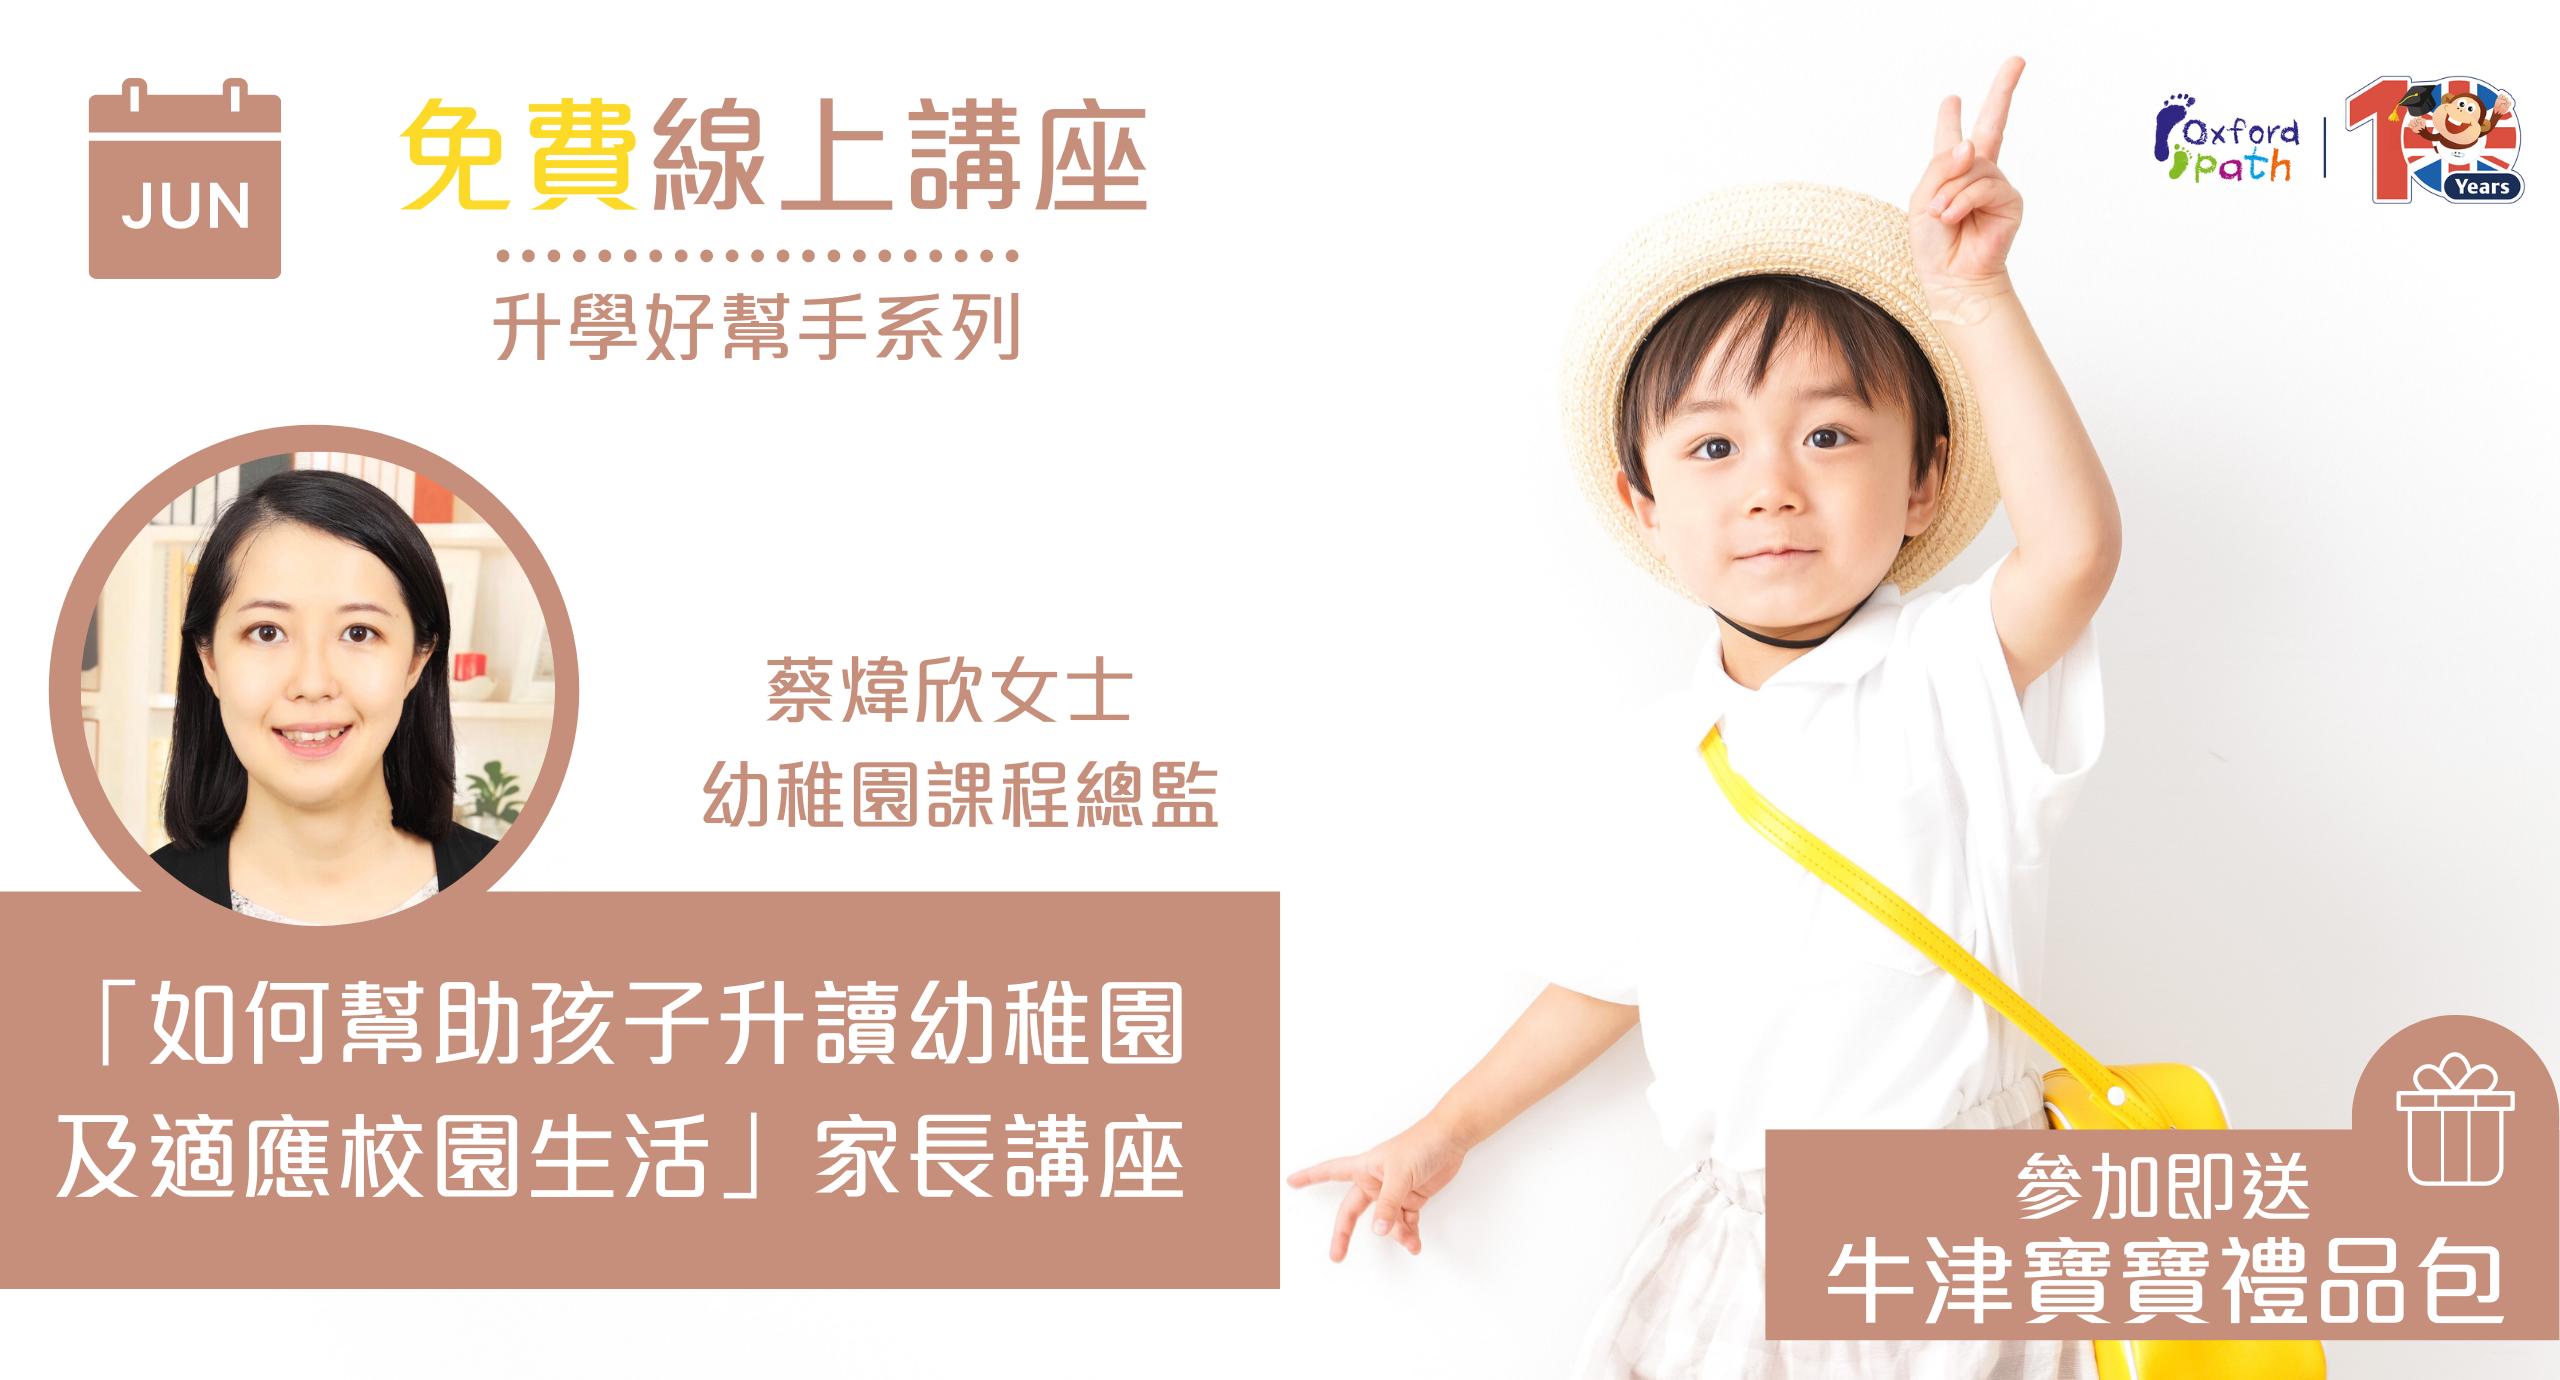 09 July 2021「「新常態」下學習──如何幫助孩子升讀幼稚園及適應校園生活」線上家長講座